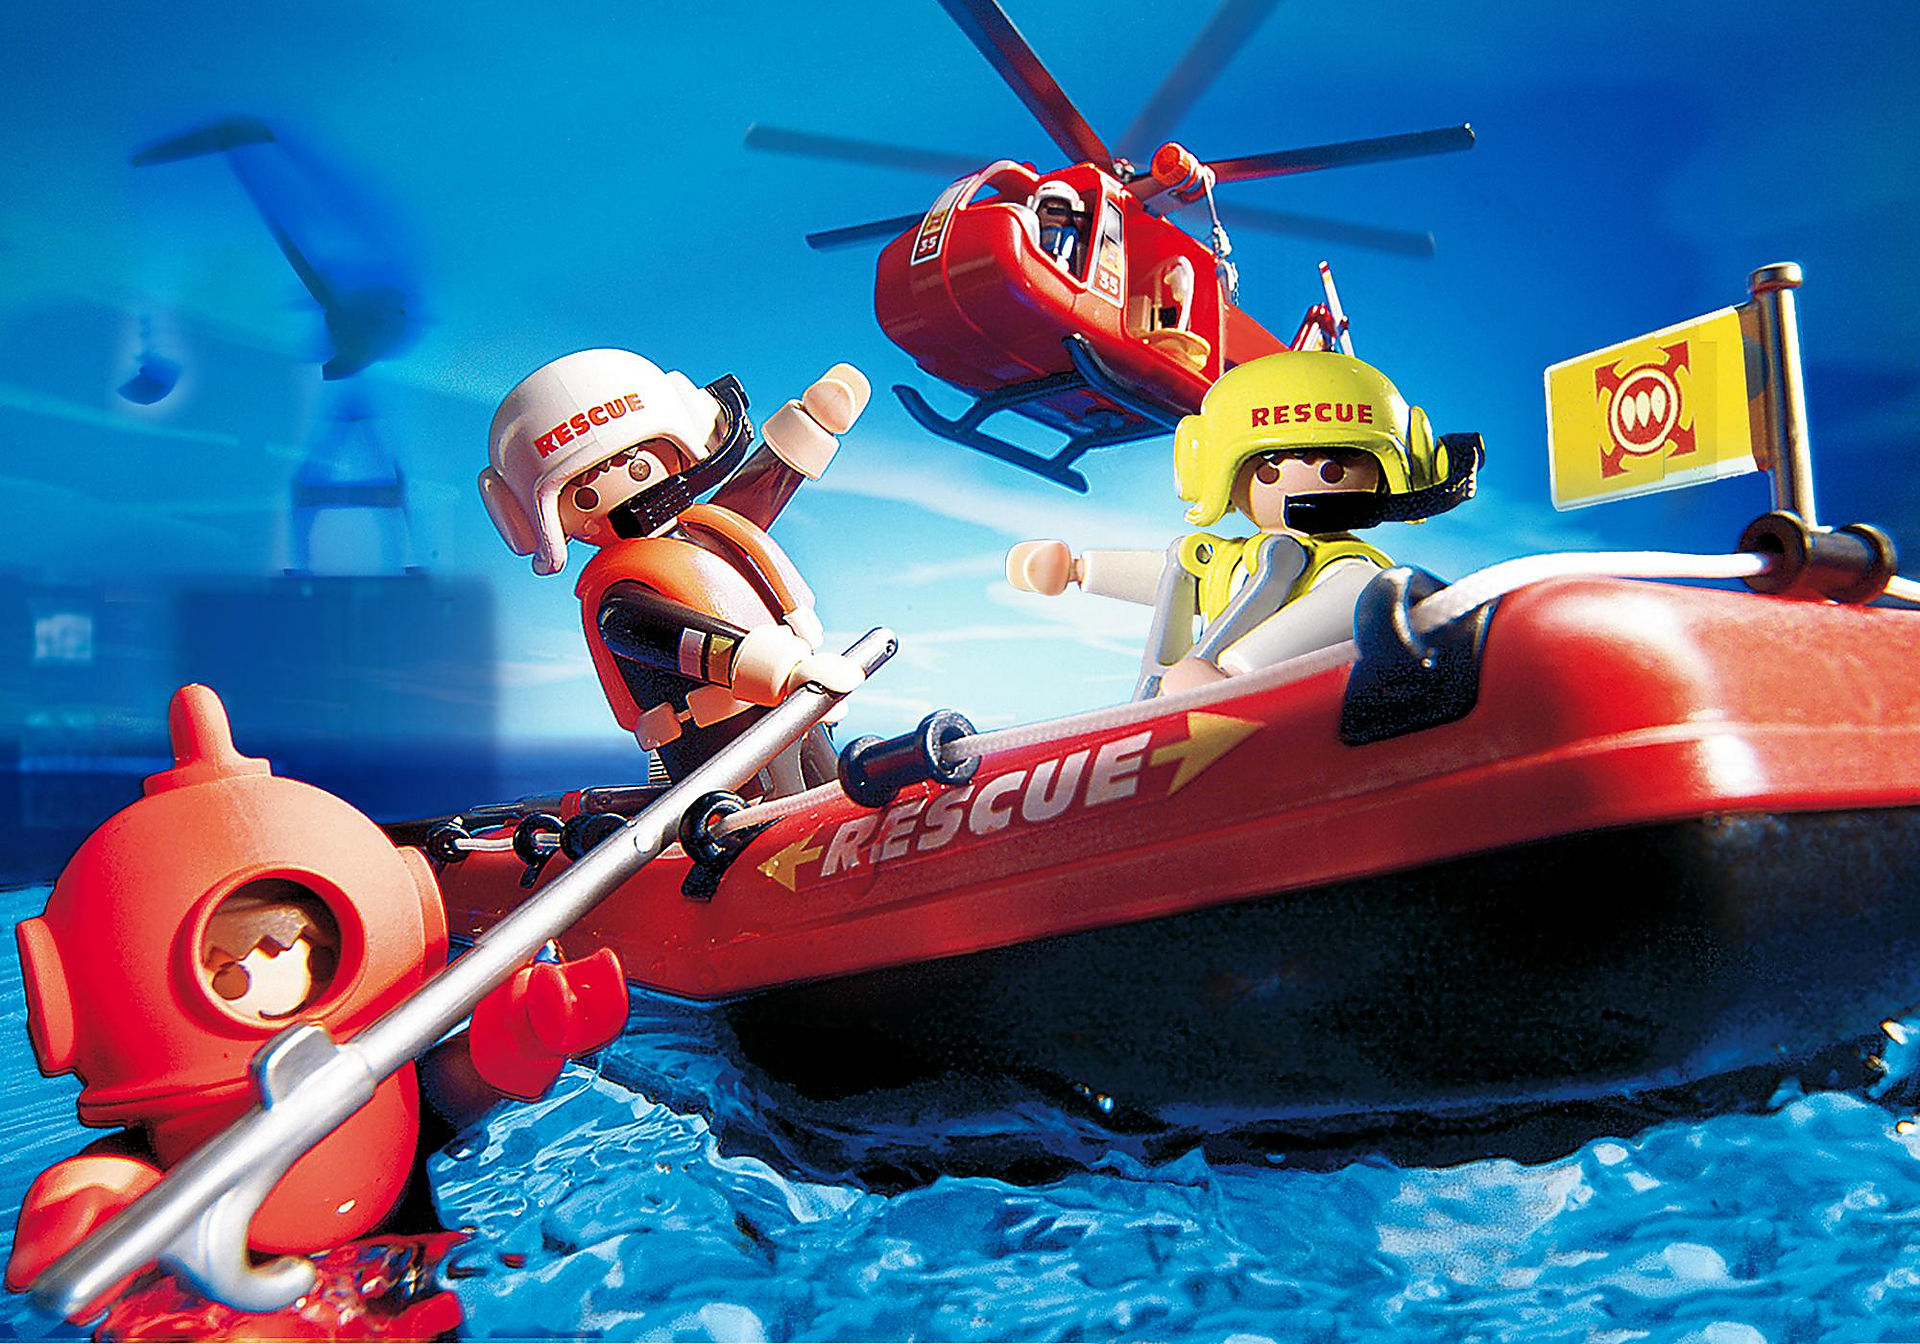 http://media.playmobil.com/i/playmobil/4428_product_extra5/SOS-Helikopter/Rettungsboot